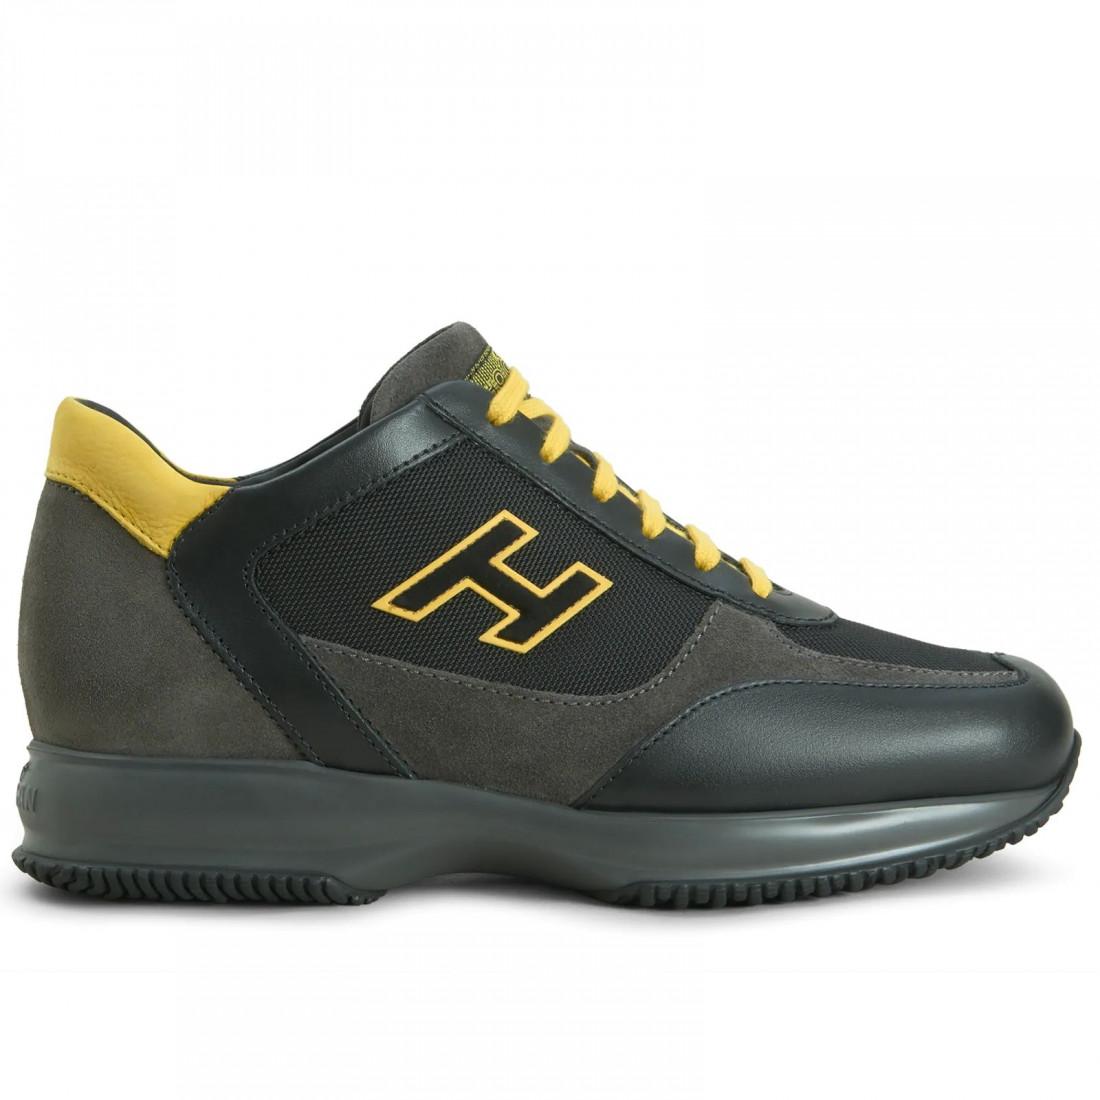 sneakers herren hogan hxm00n0q101o8m50bj 7409